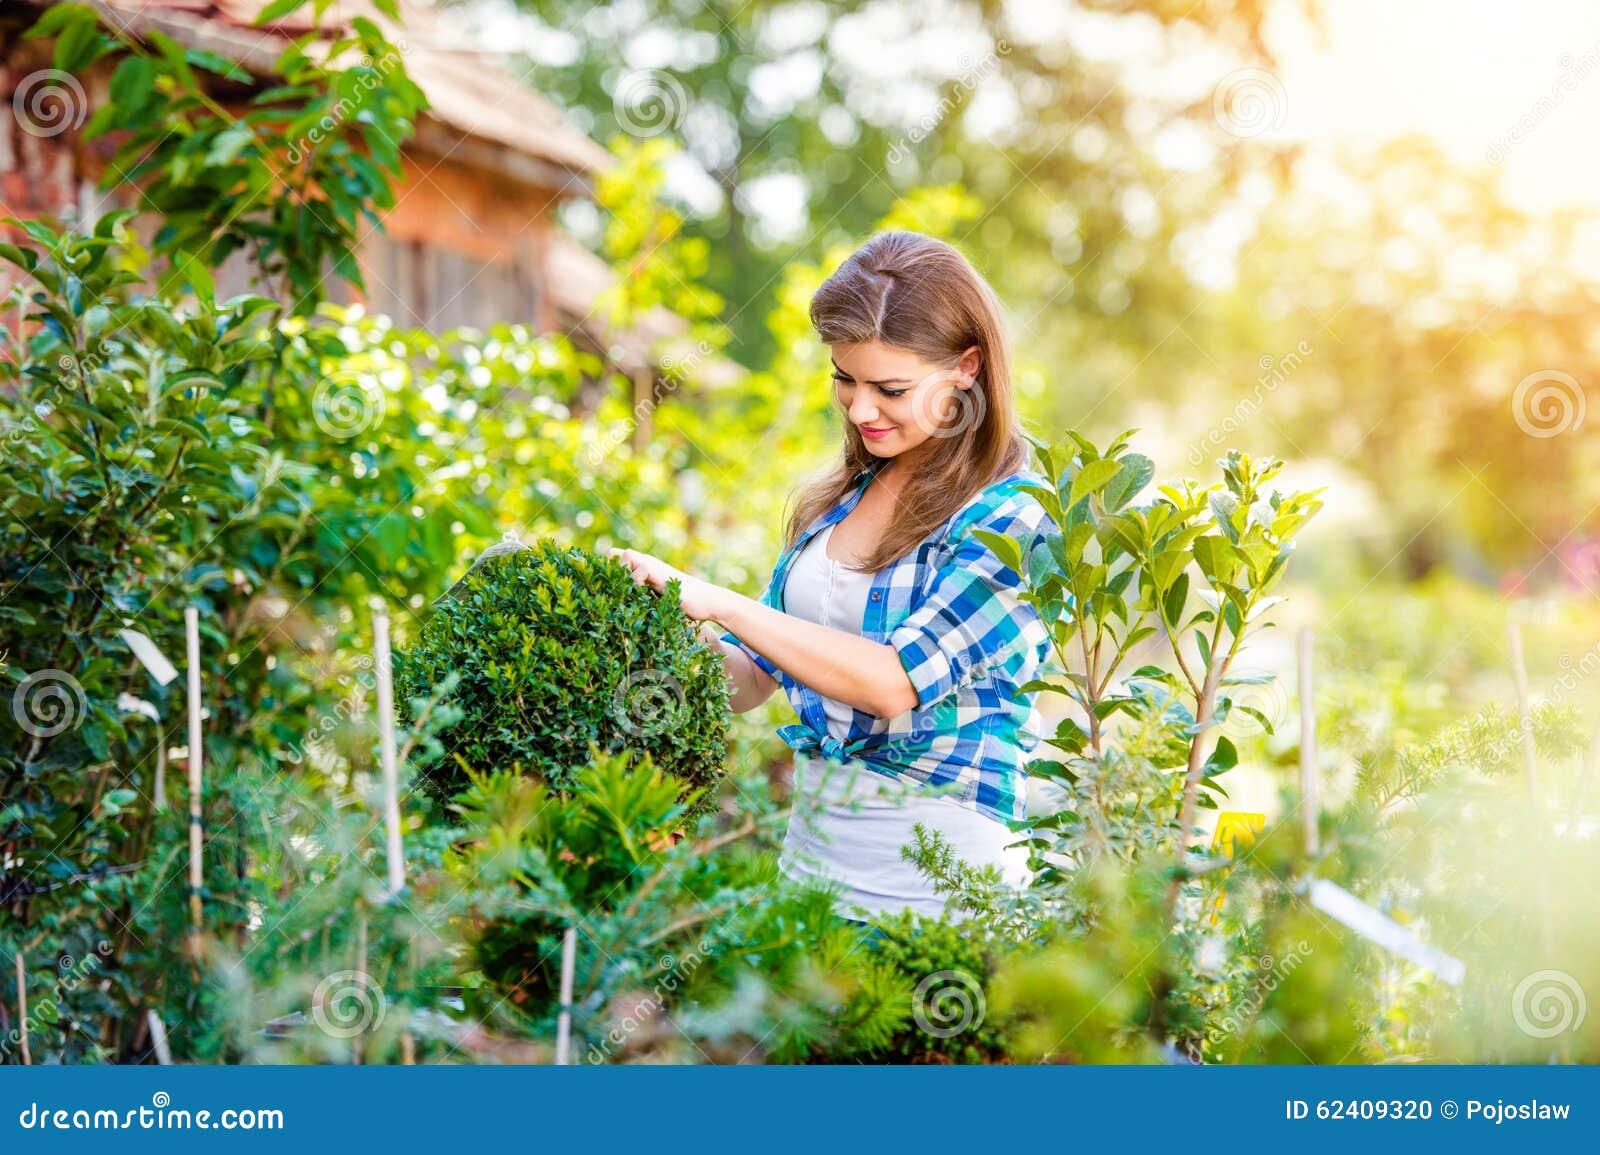 Beautiful Young Woman Gardening Stock Photo Image 62409320